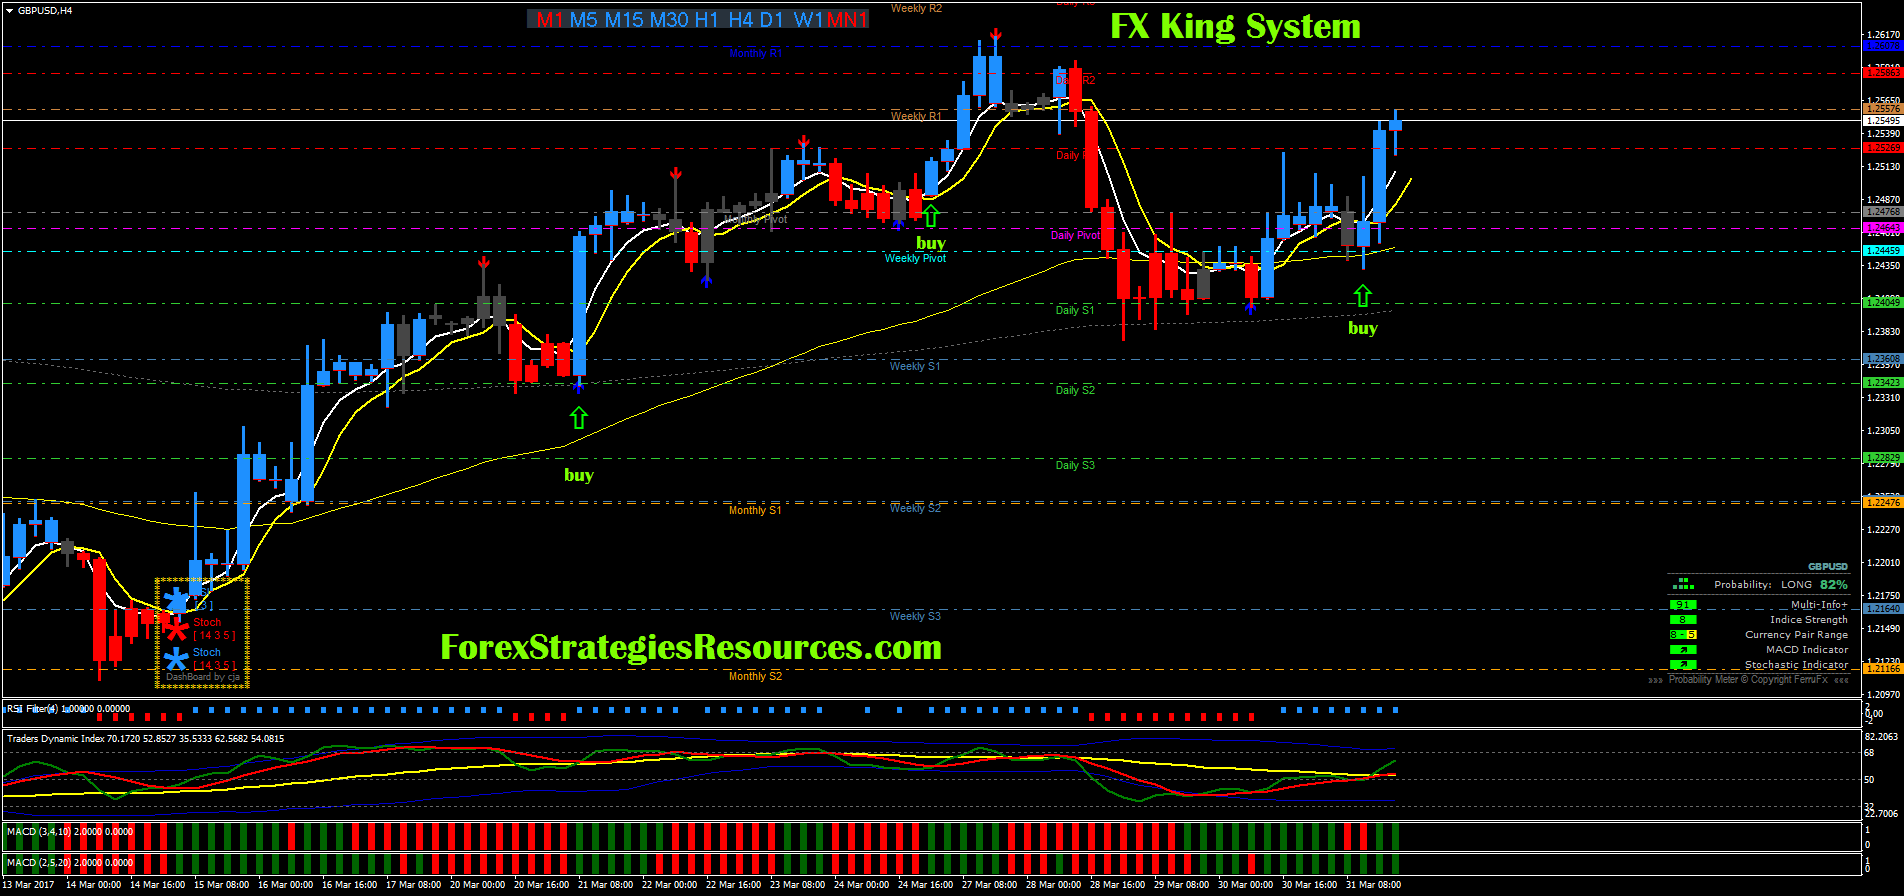 FX King System - Forex Strategies - Forex Resources - Forex Trading-free forex trading signals ...